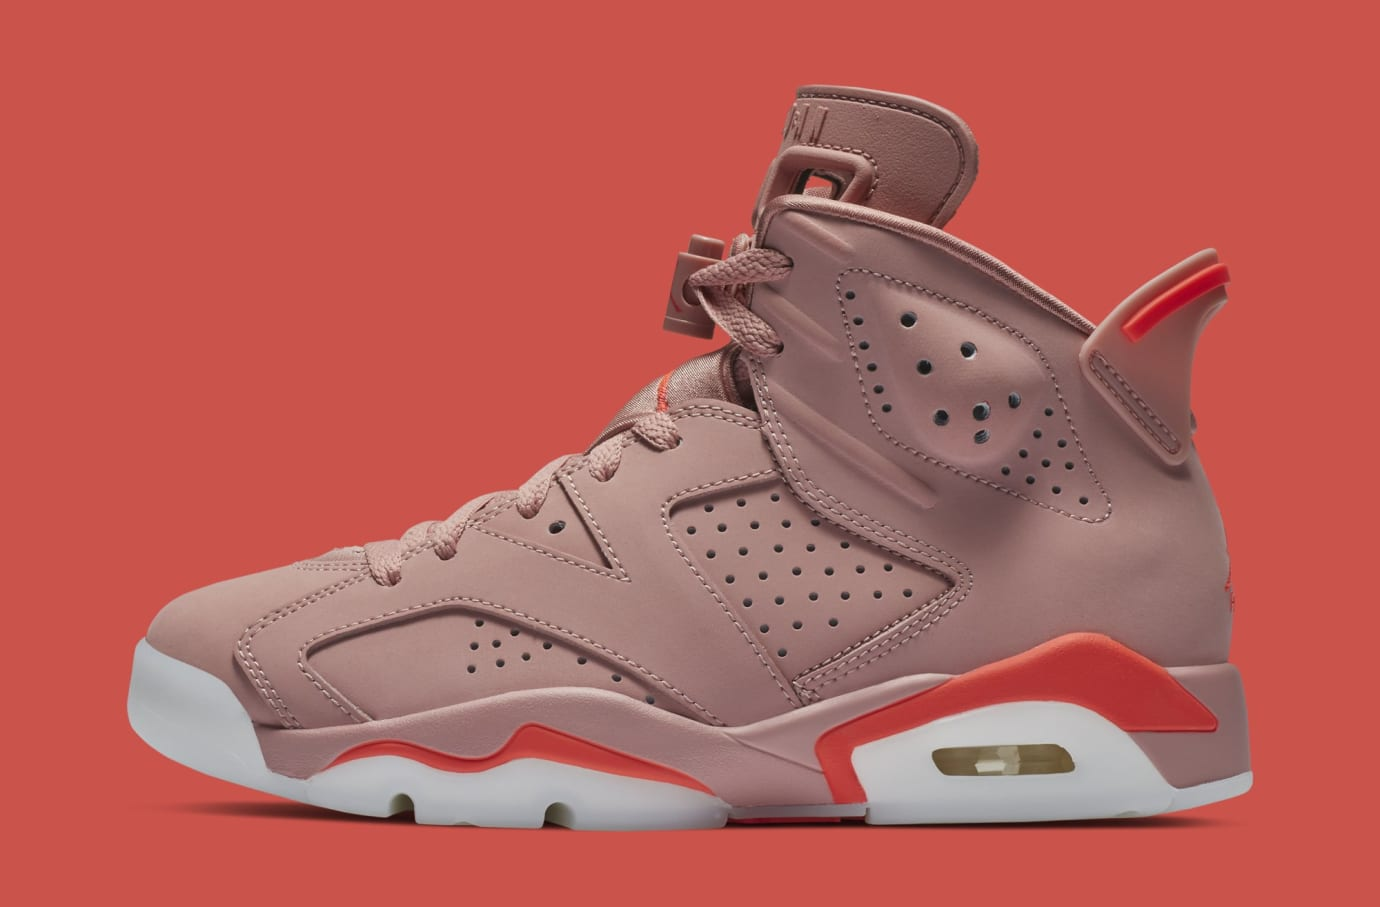 dcbfa730082 Aleali May x Air Jordan 6 'Millennial Pink' CI0550-600 Release Date ...